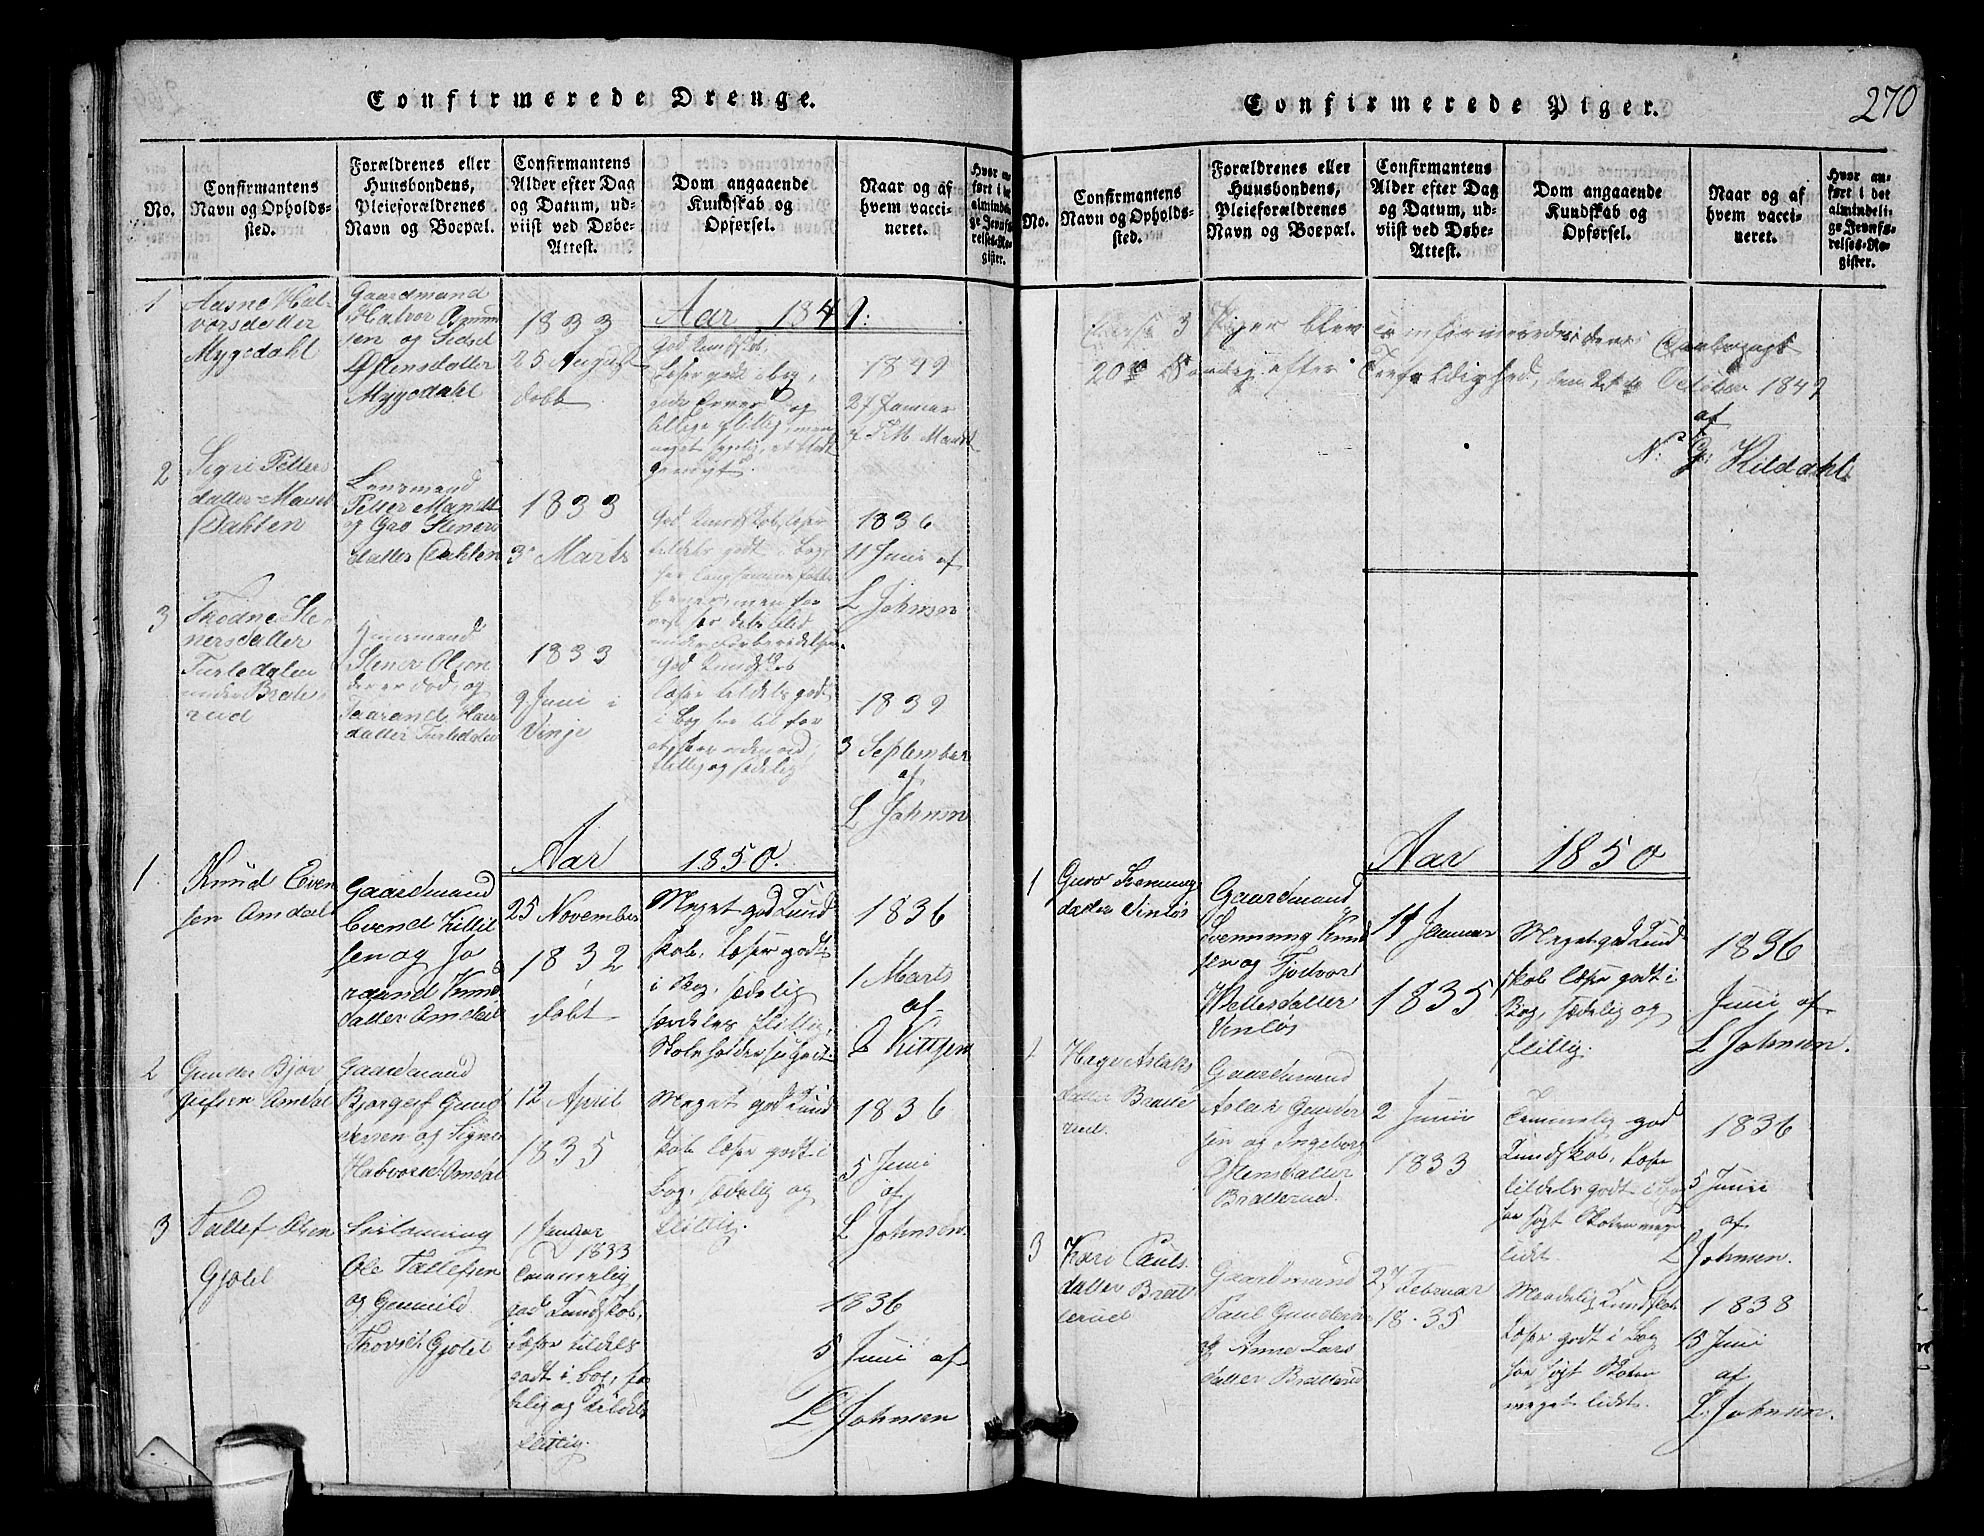 SAKO, Lårdal kirkebøker, G/Gb/L0001: Klokkerbok nr. II 1, 1815-1865, s. 270